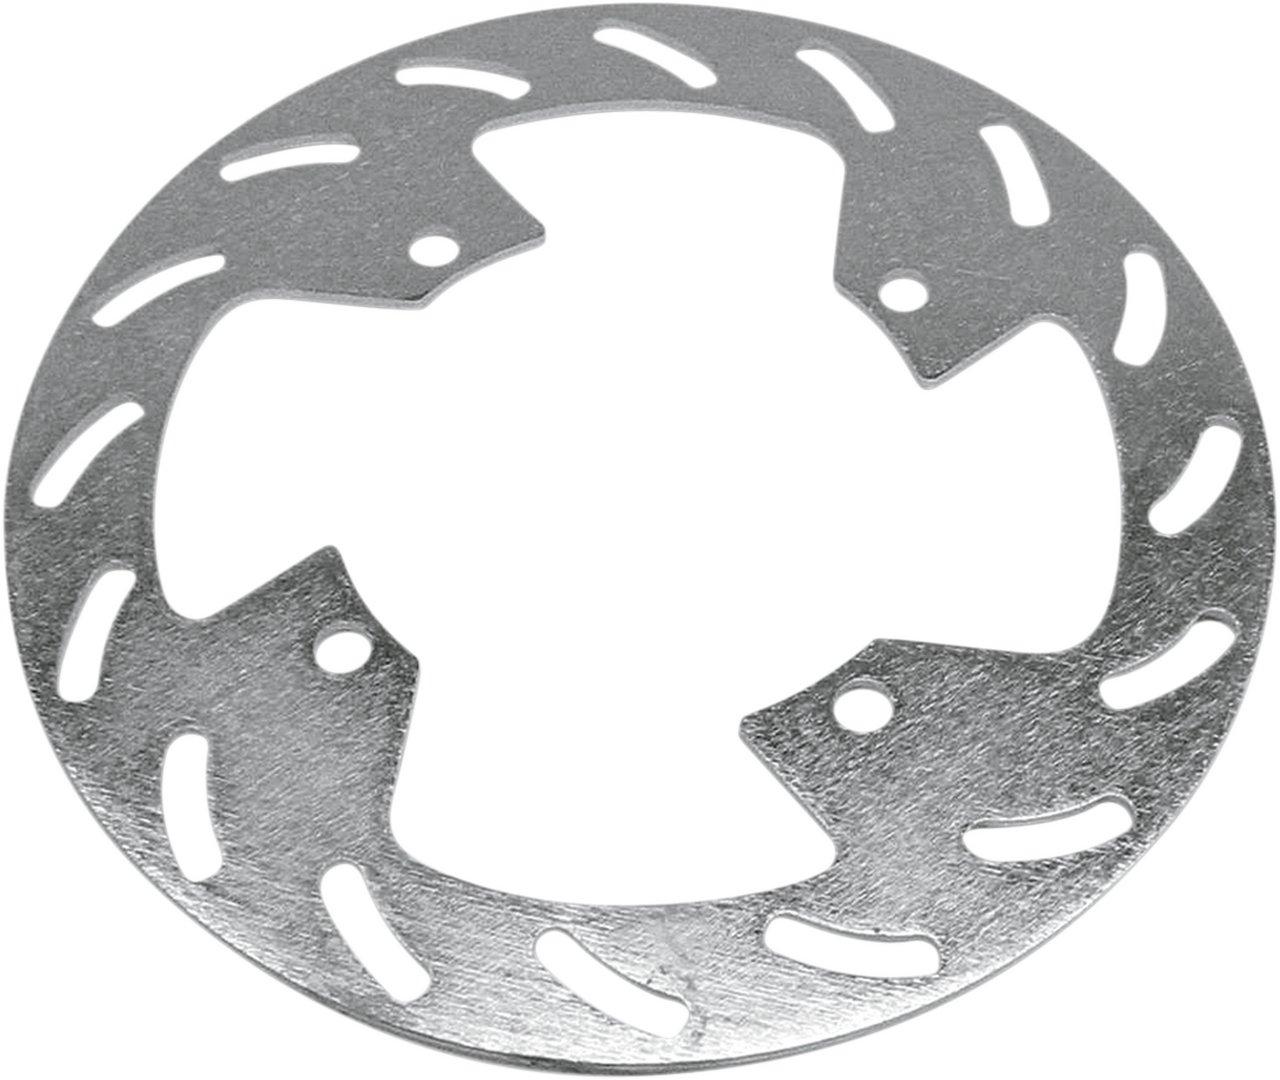 【MOOSE RACING】原廠維修用煞車碟盤 [M061-1310] - 「Webike-摩托百貨」